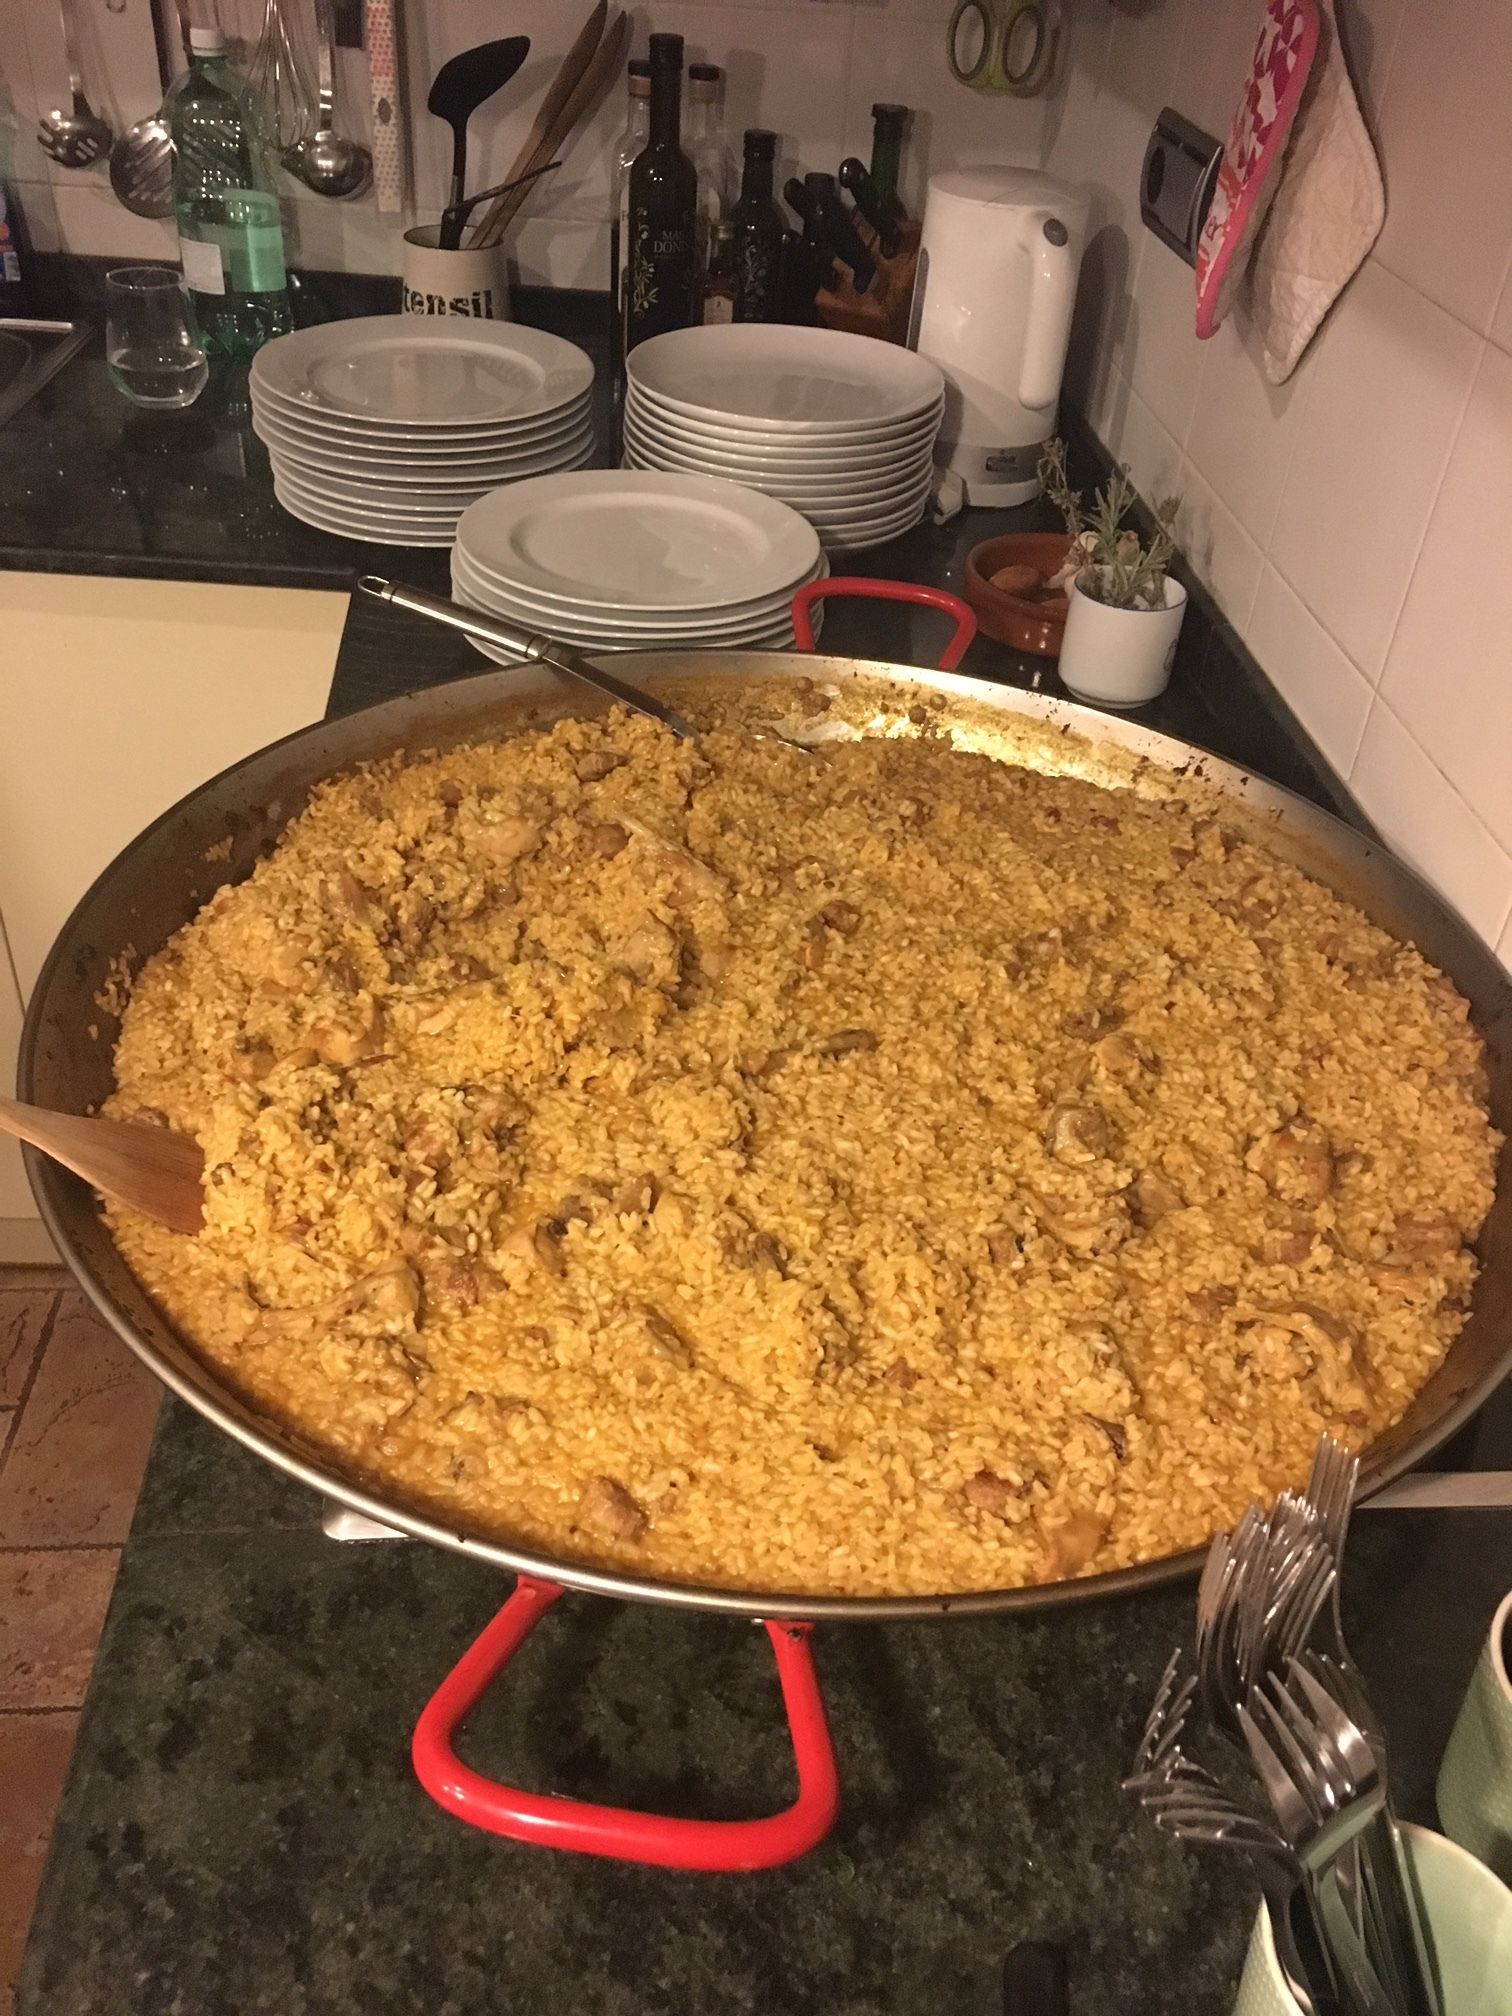 mountain paella: no seafood